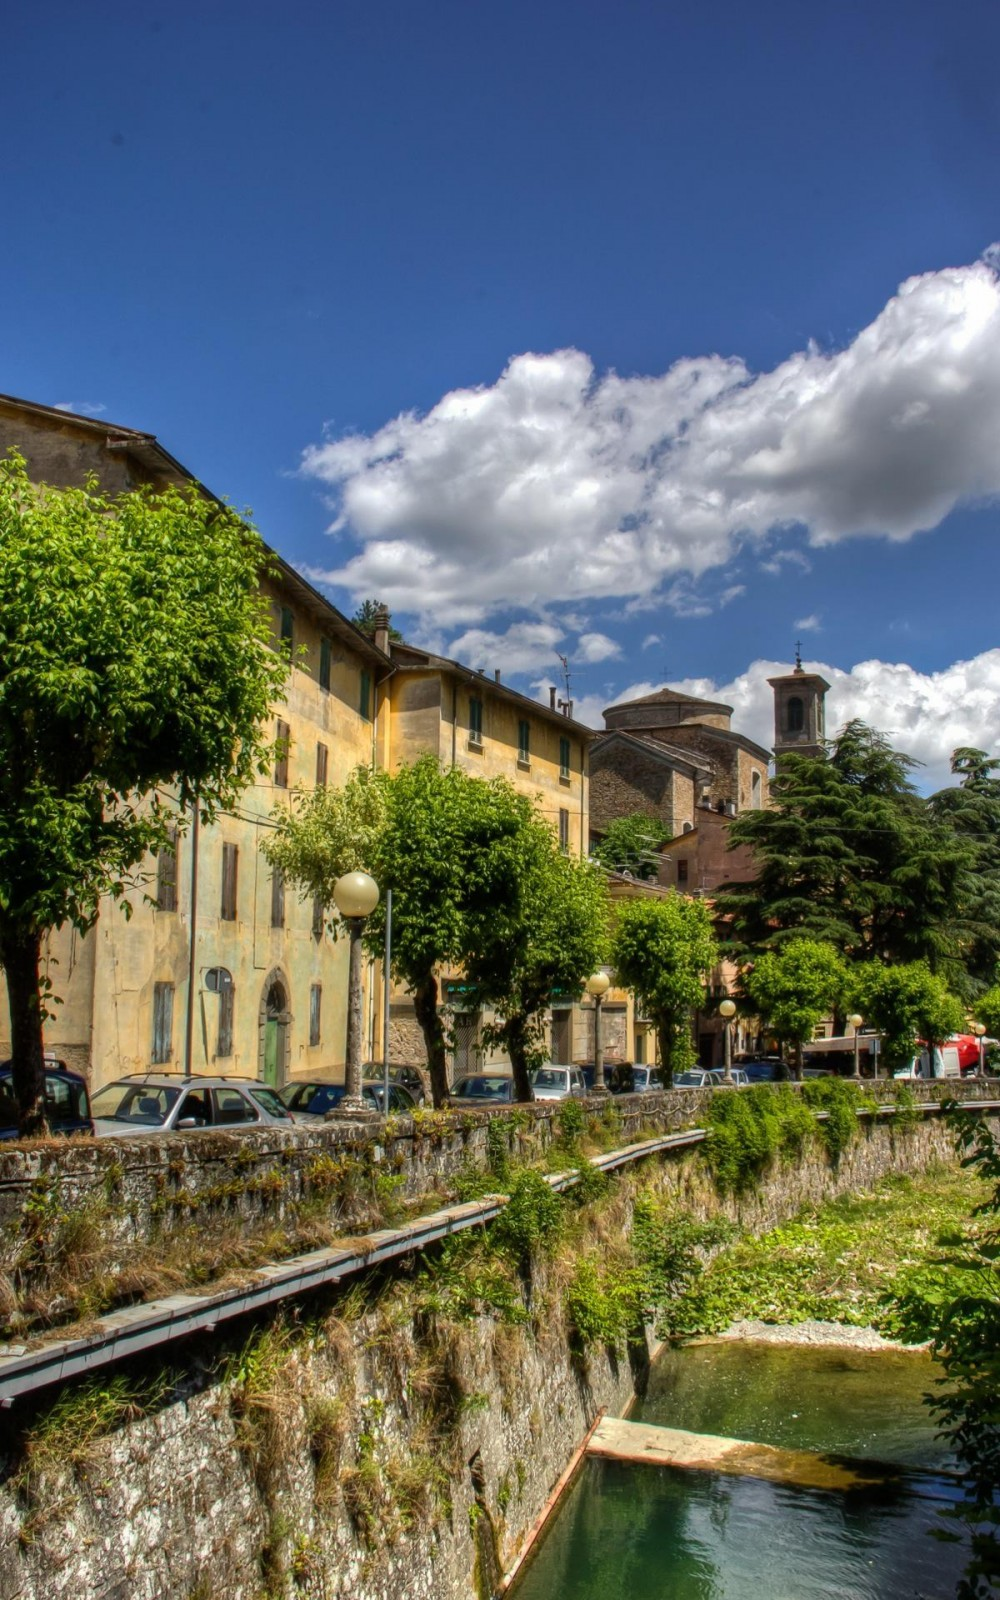 View of Terme di Porretta